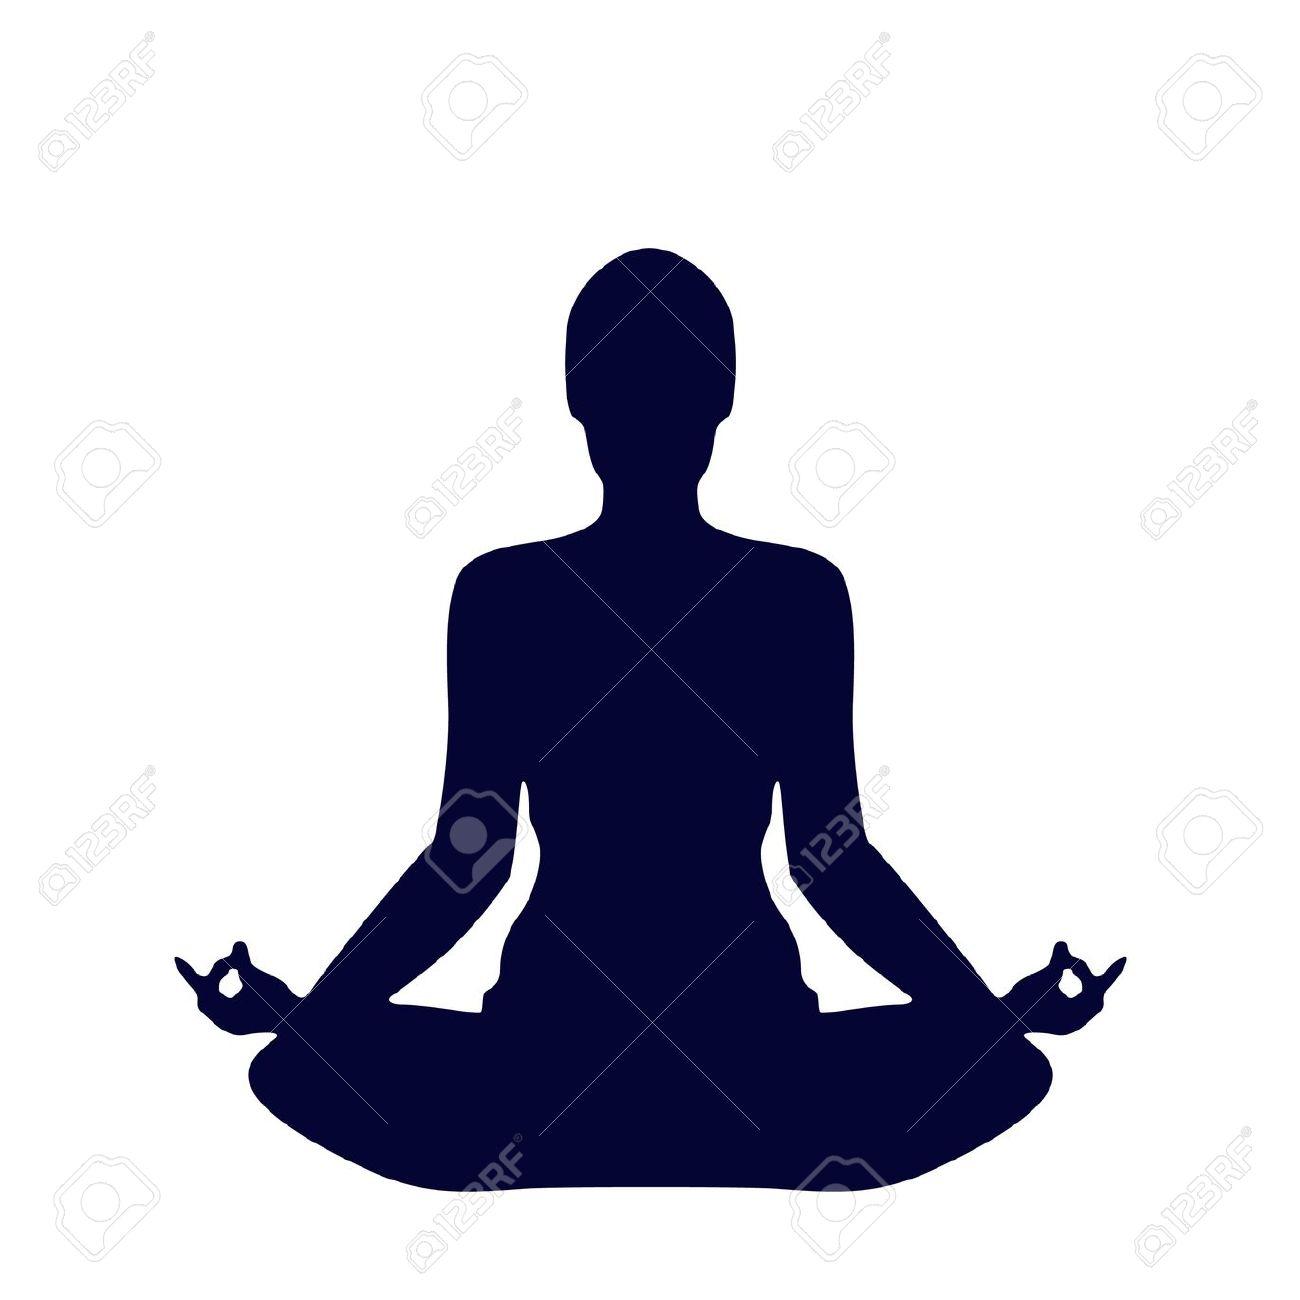 1300x1300 Meditation Clipart Silhouette 3705138